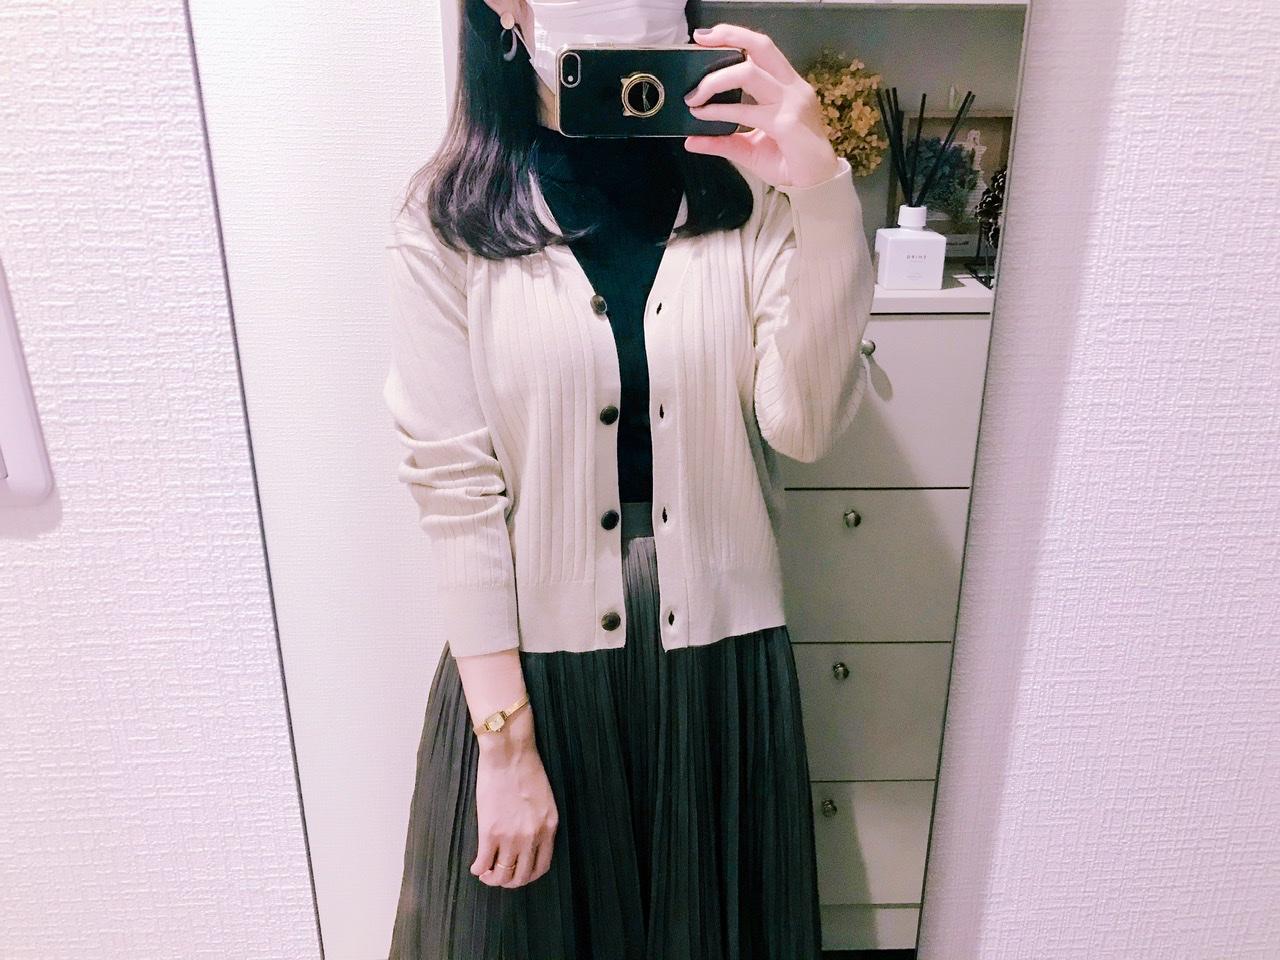 【GU】今すぐ使える《パンプス×カーデ》実用性◎な秋アイテム♡_4